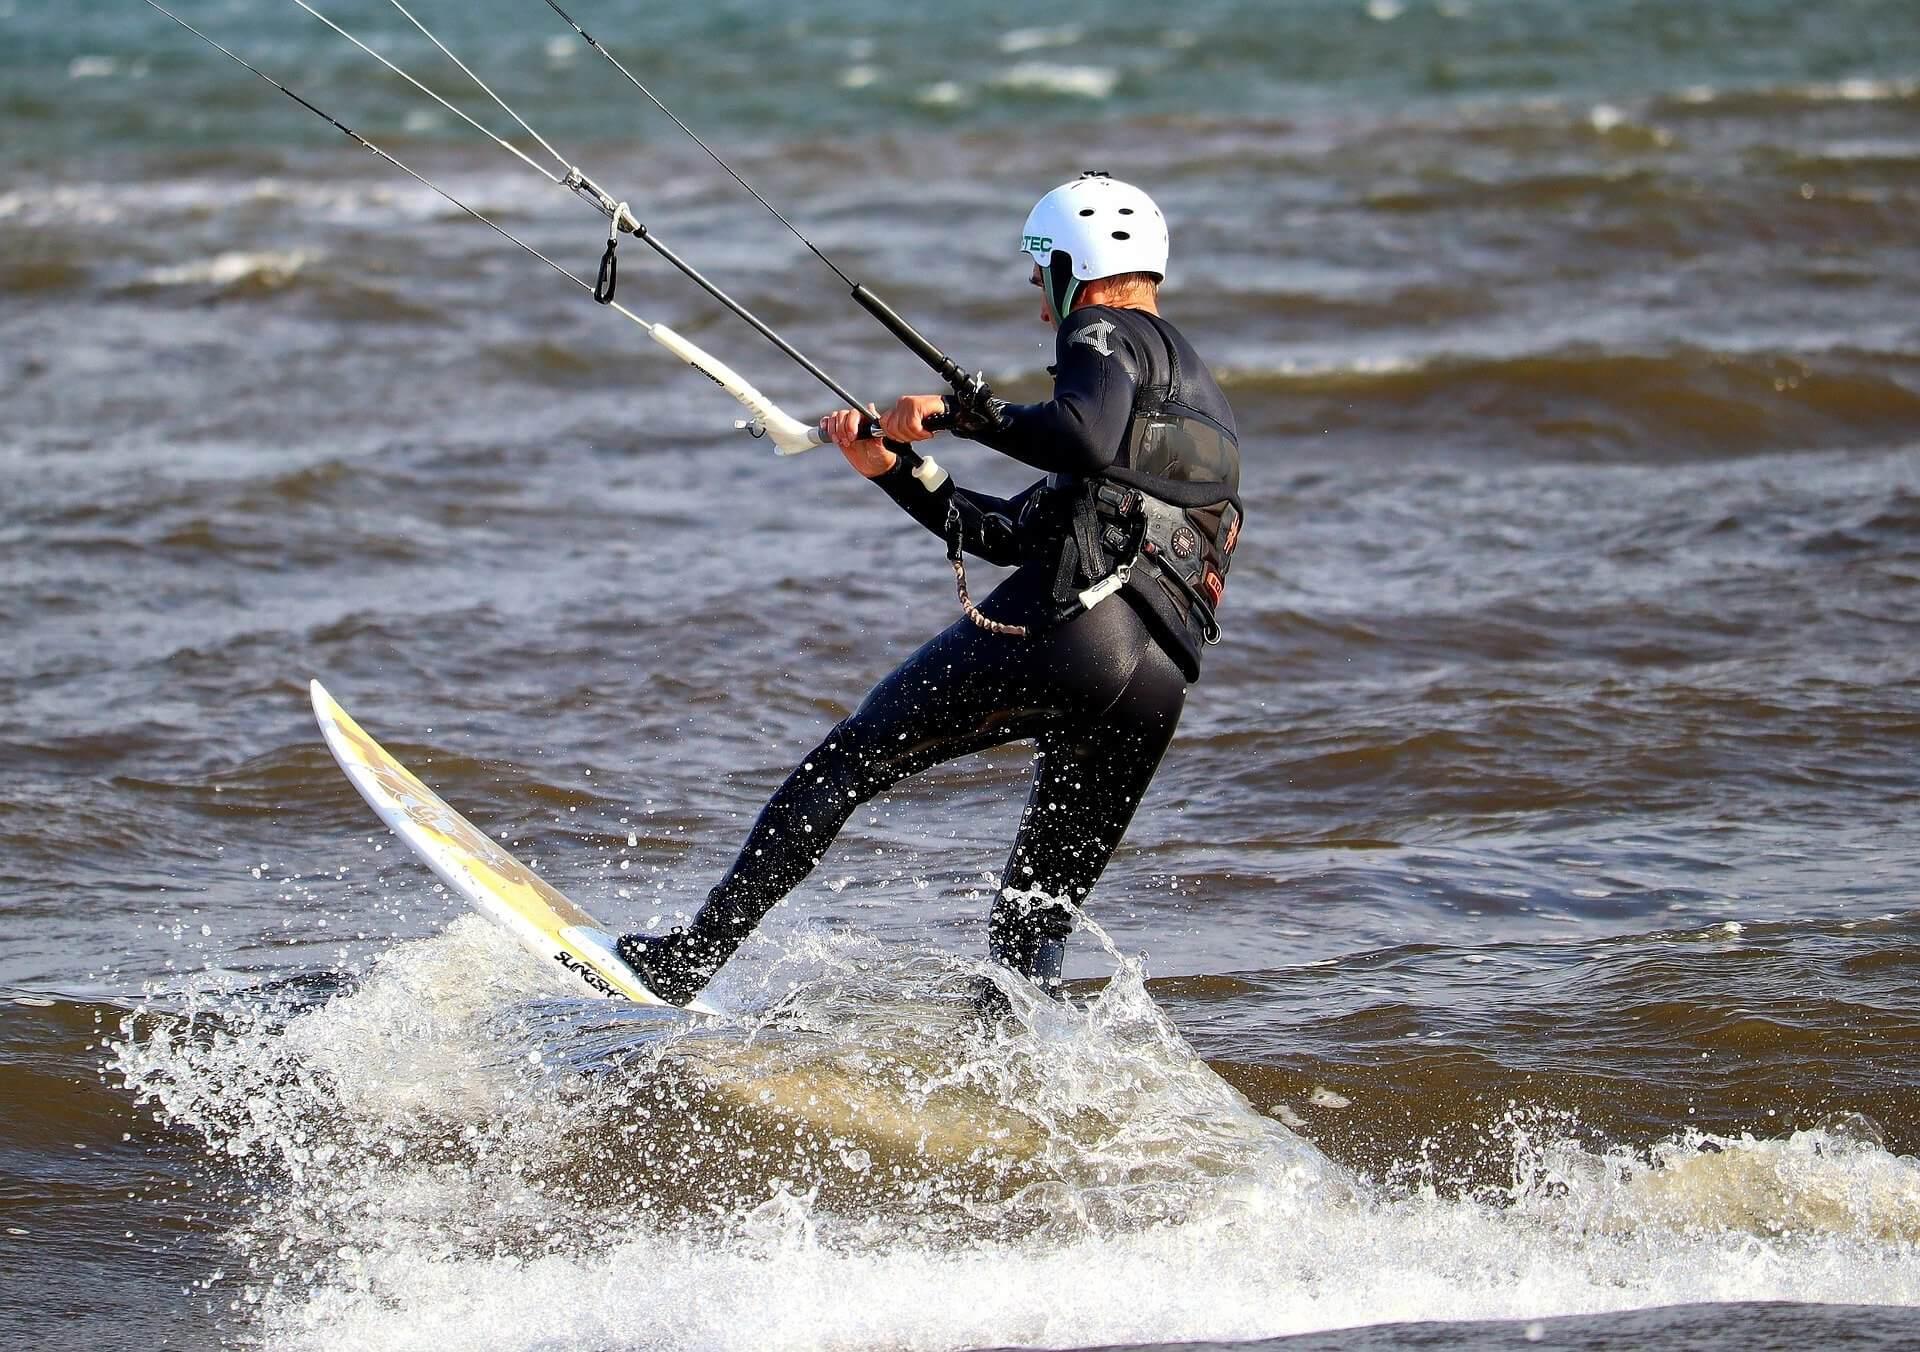 Autour de La FabriK' en Baie : Kitesurf